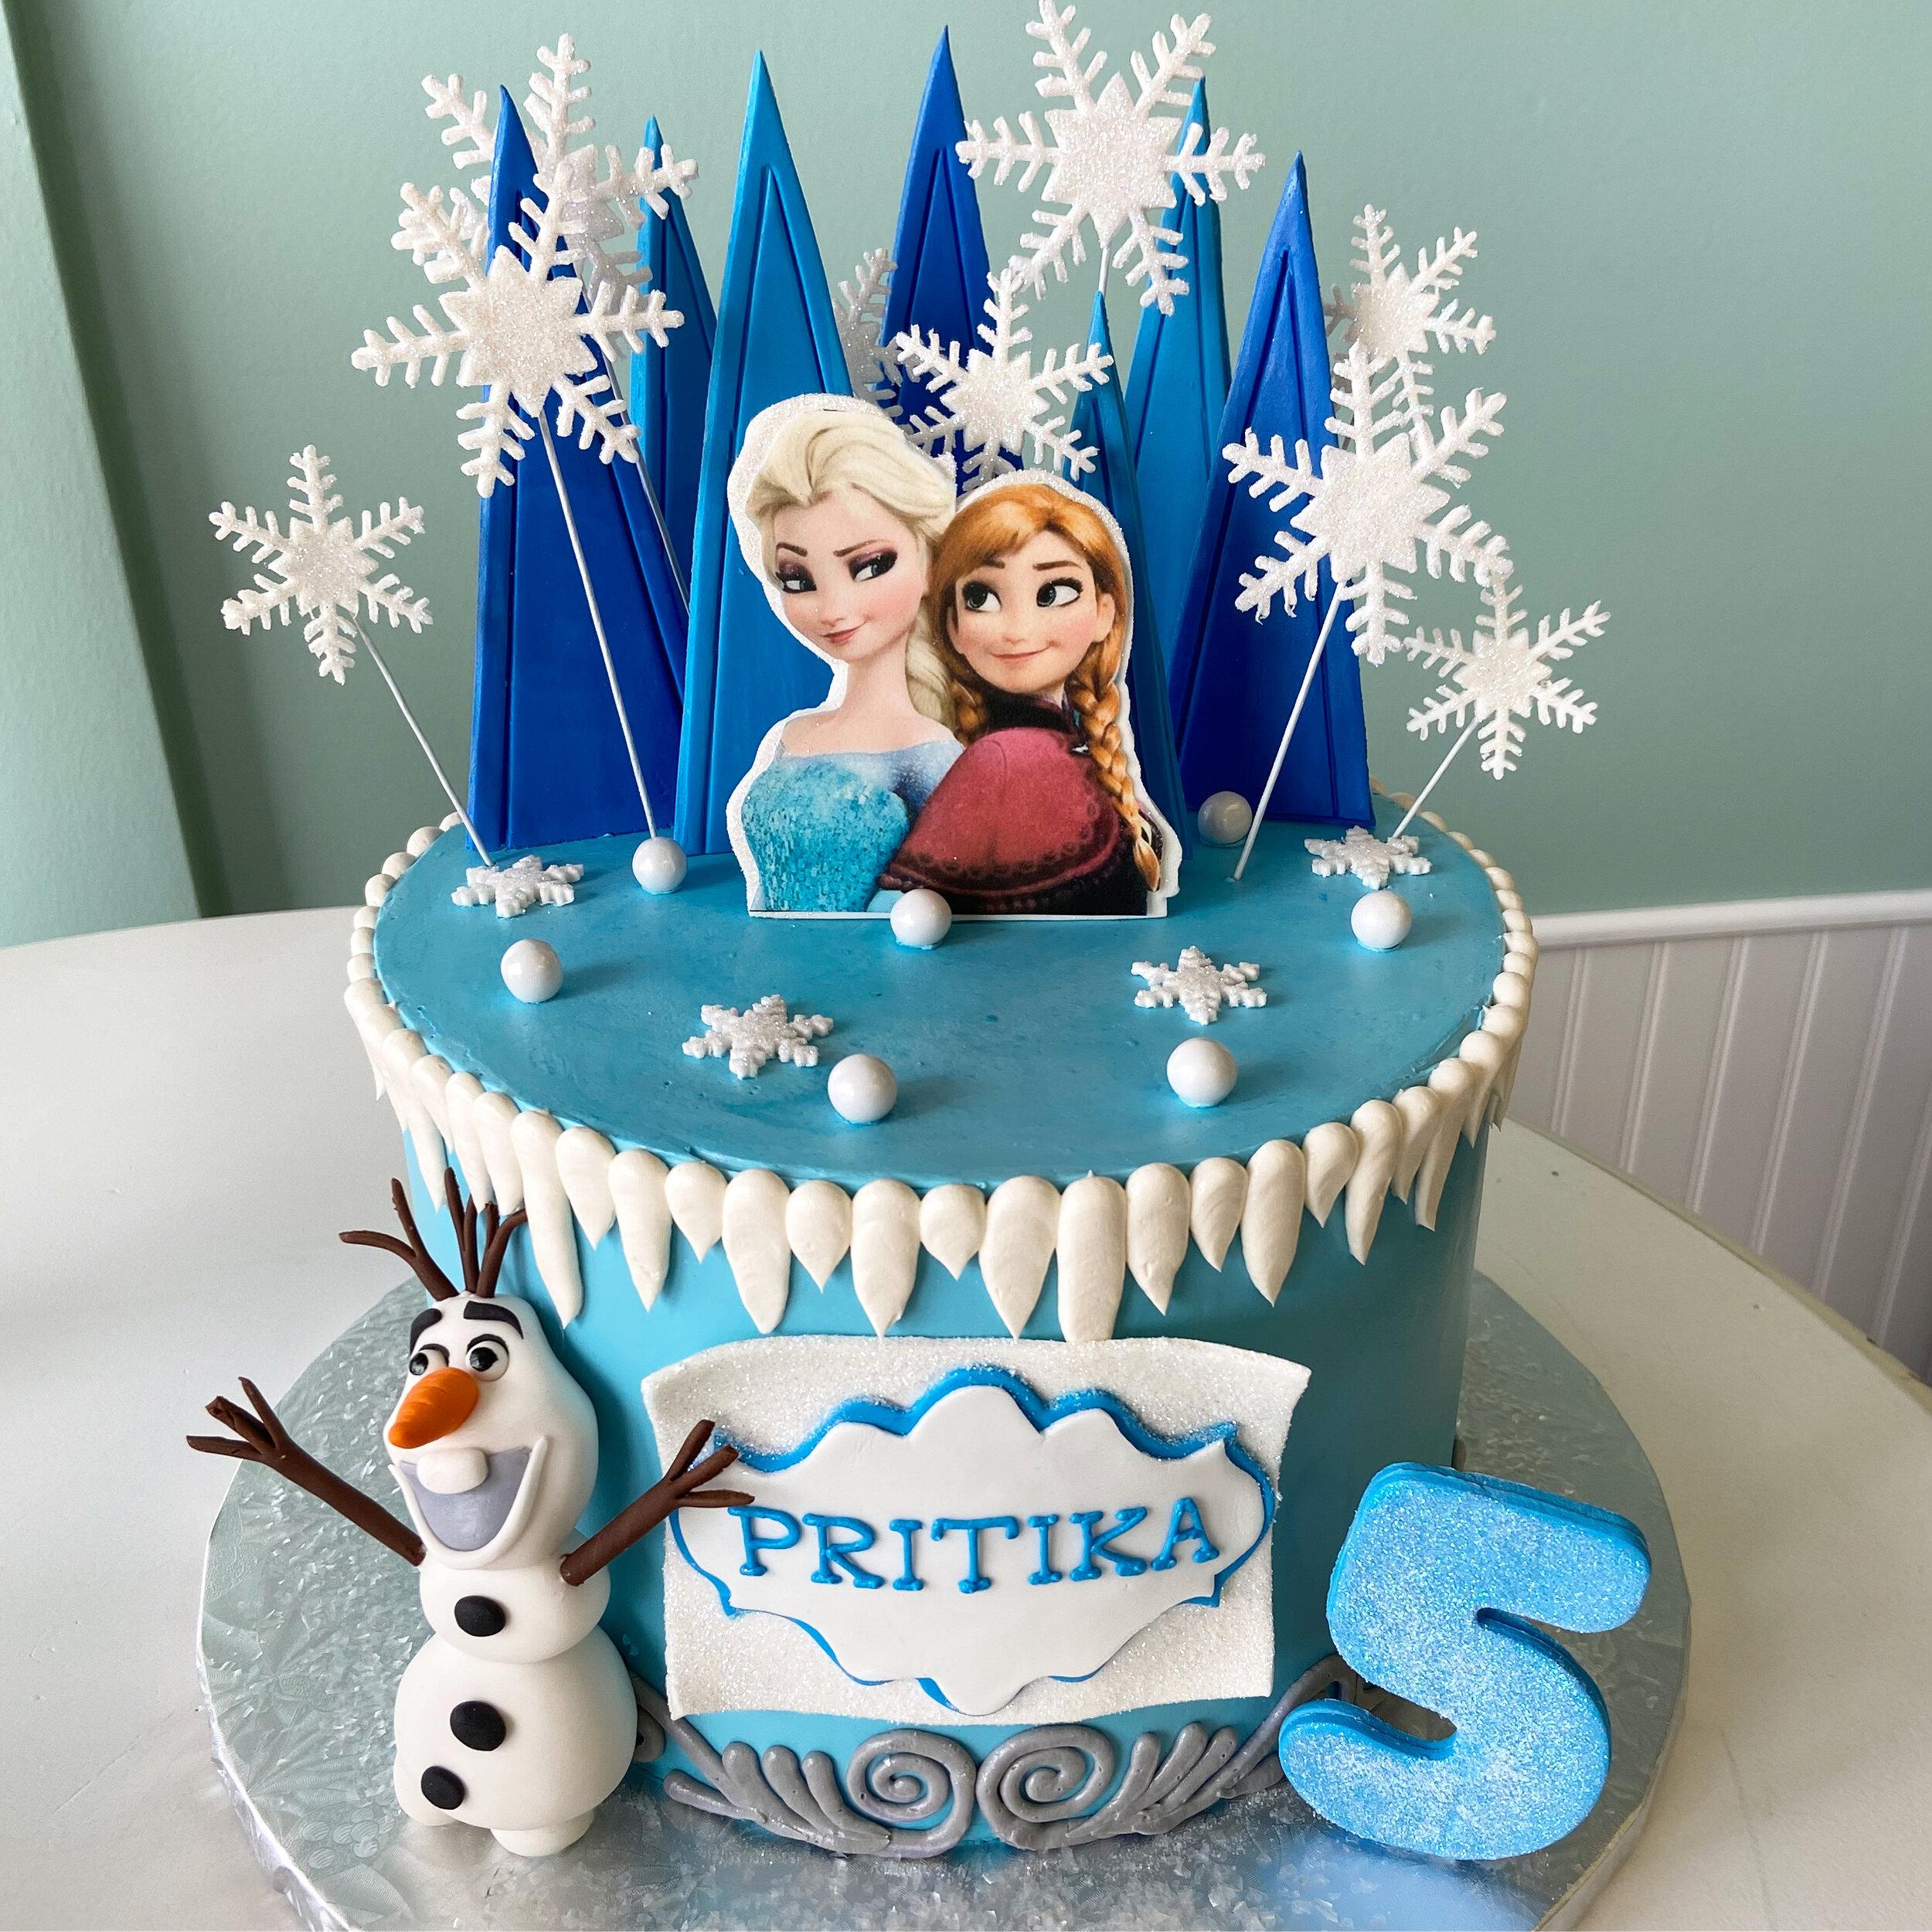 Birthday cake for her online. Girls Birthday Celebrating Life Cake Boutique